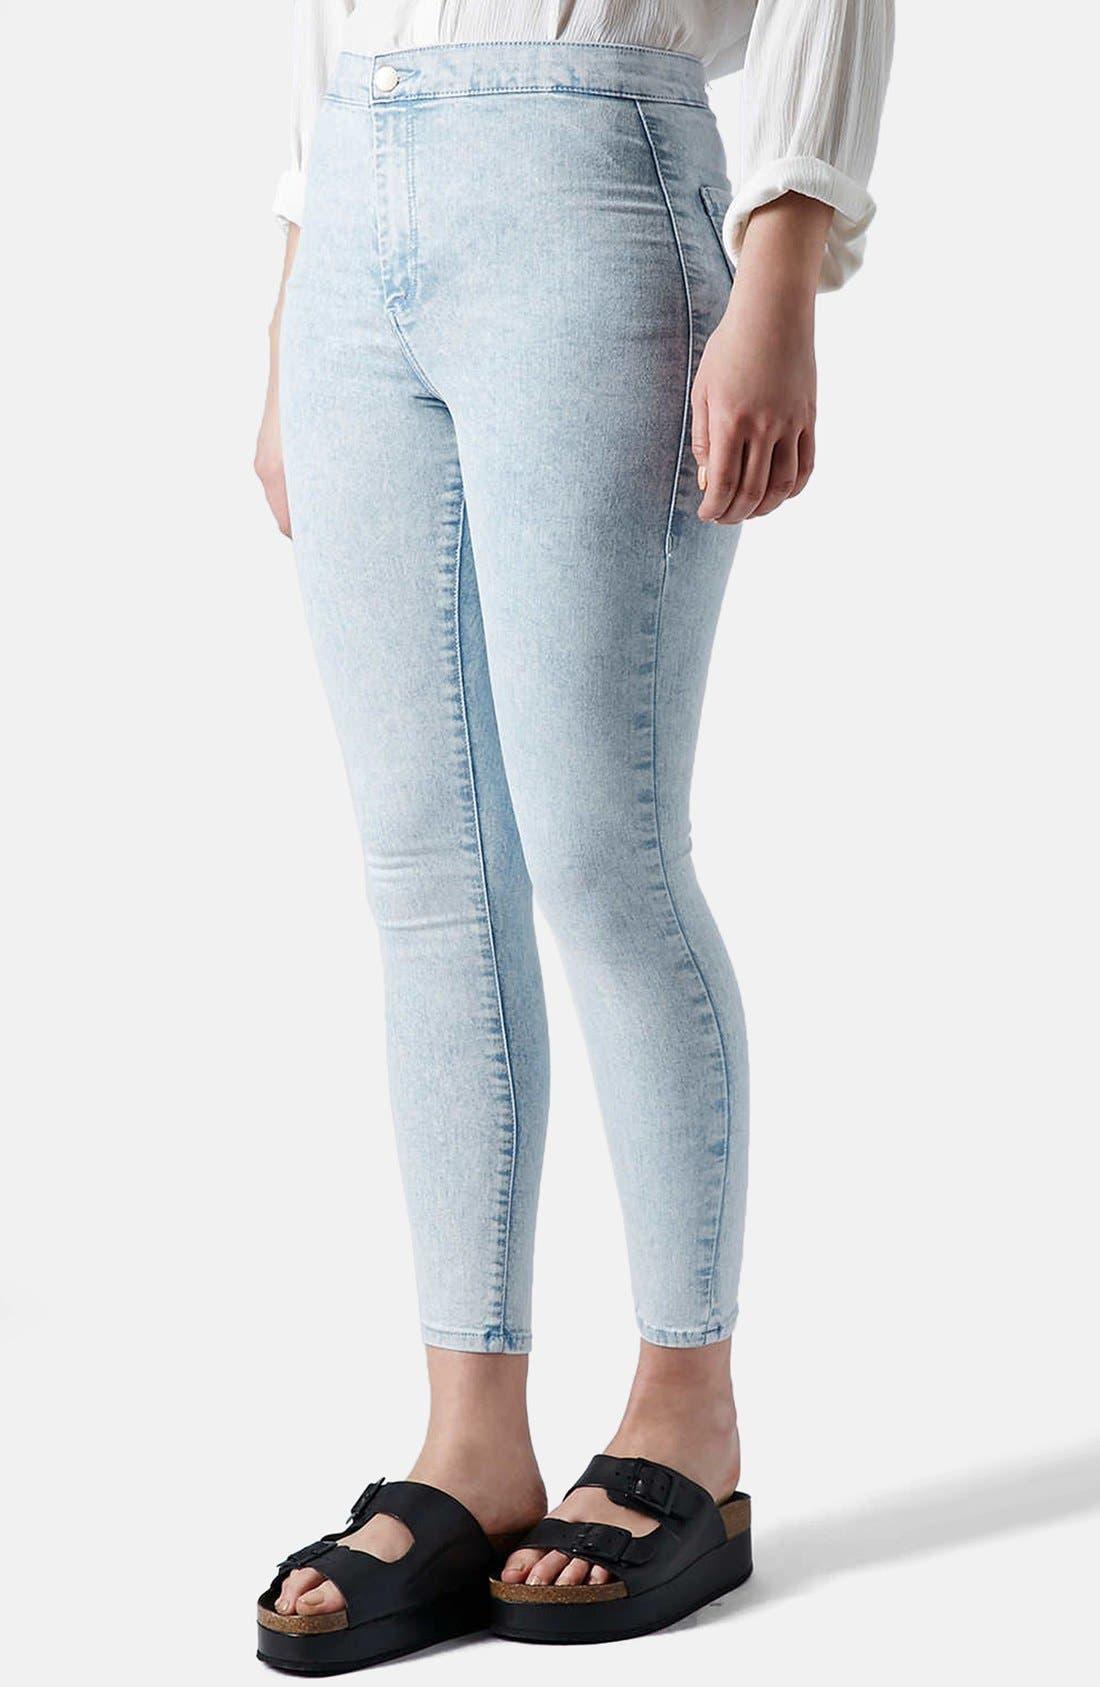 Main Image - Topshop 'Joni' Mottled Ultra Skinny Jeans (Bleach Stone)